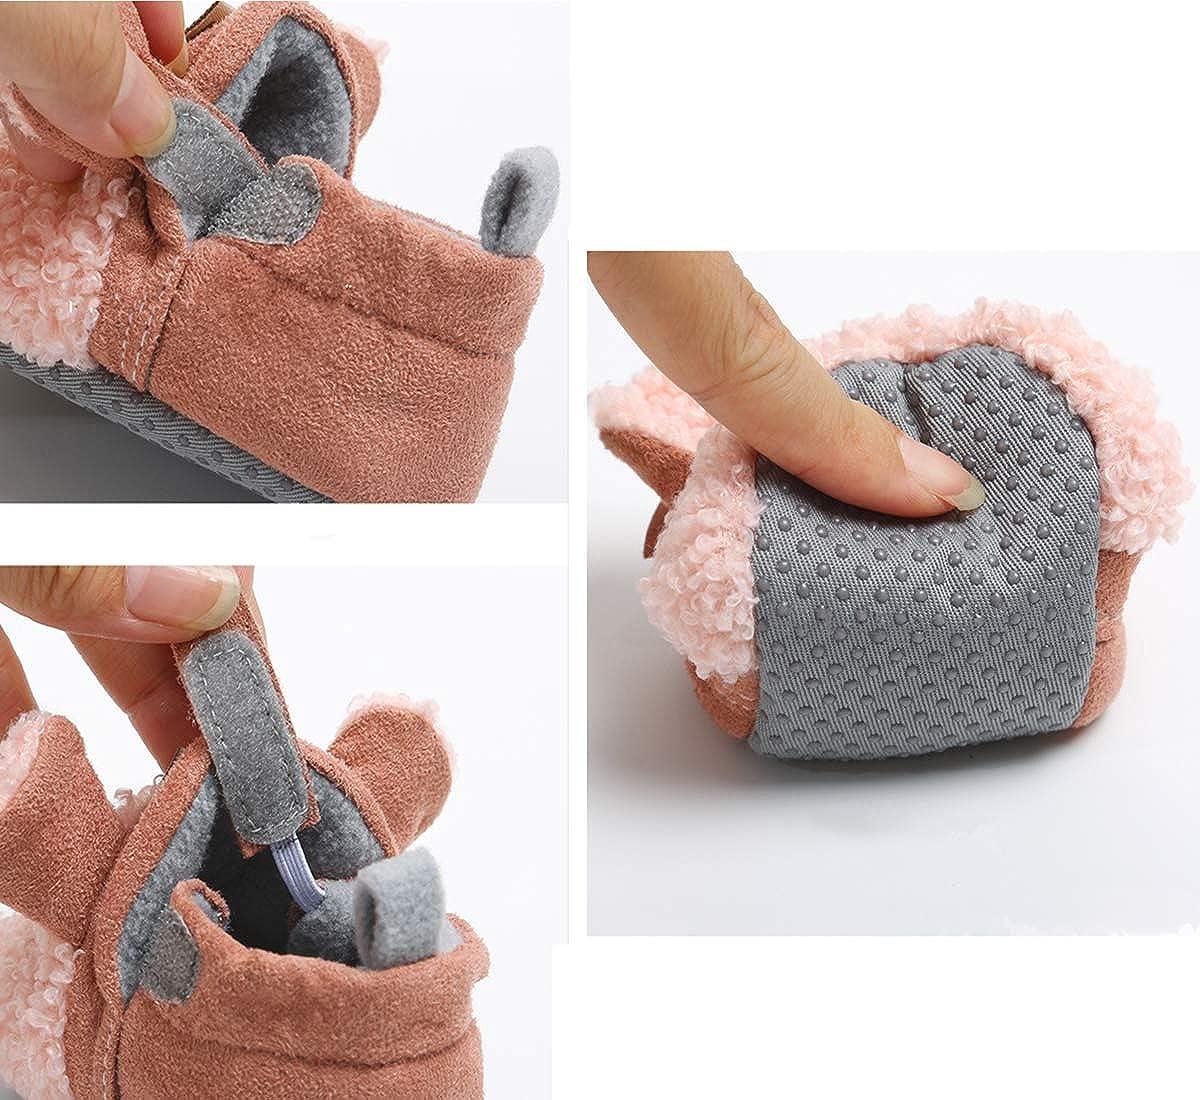 RVROVIC Baby Boys Girls Cozy Fleece Booties with Non Skid Bottom Warm Winter Socks